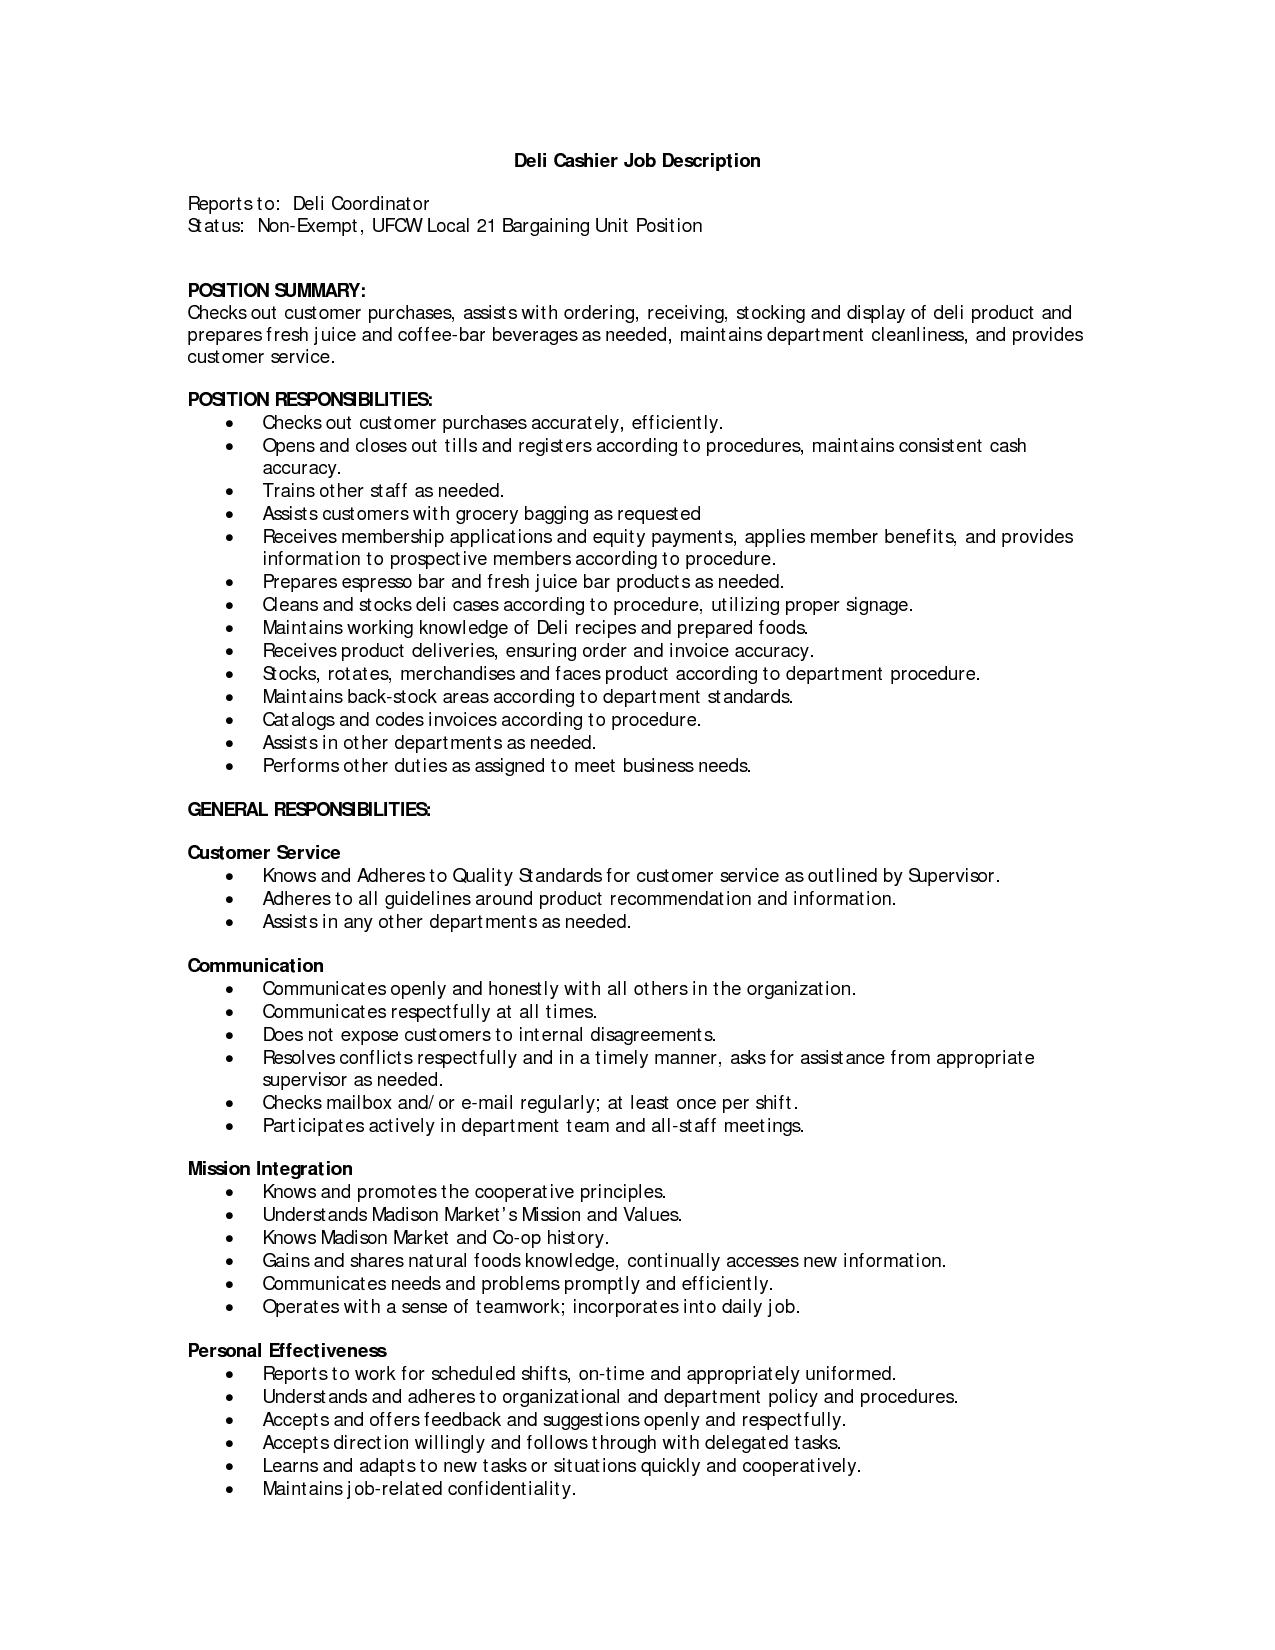 Awesome Restaurant Cashier Job Description Sample Contemporary For Resume Customer Service Resume Job Description Server Resume